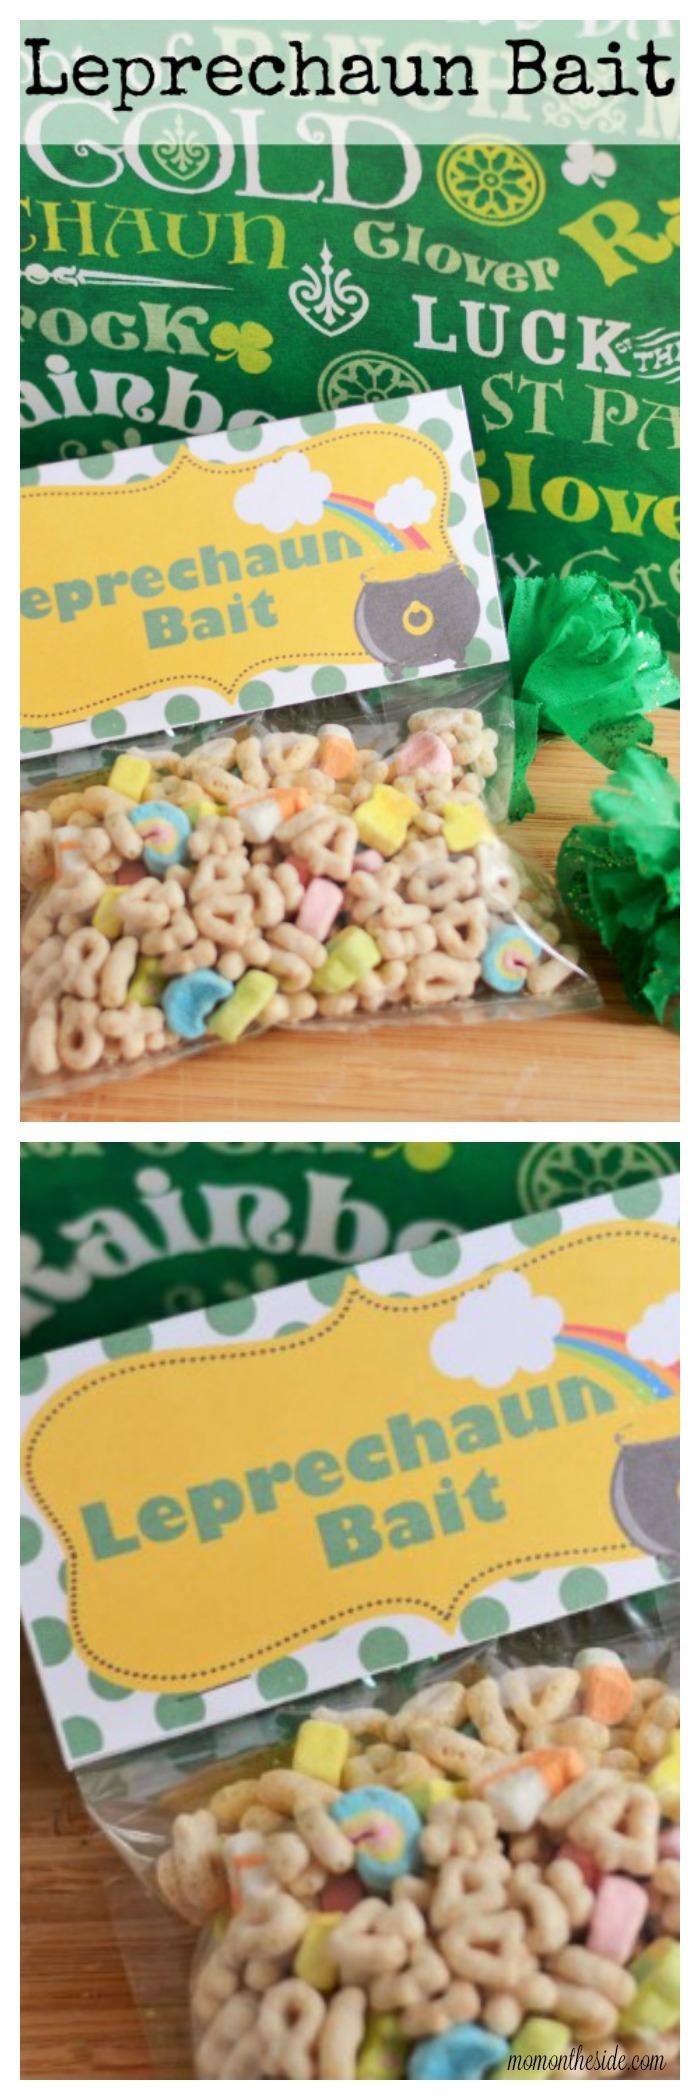 Leprechaun Bait {St. Patrick's Day Class Treat}